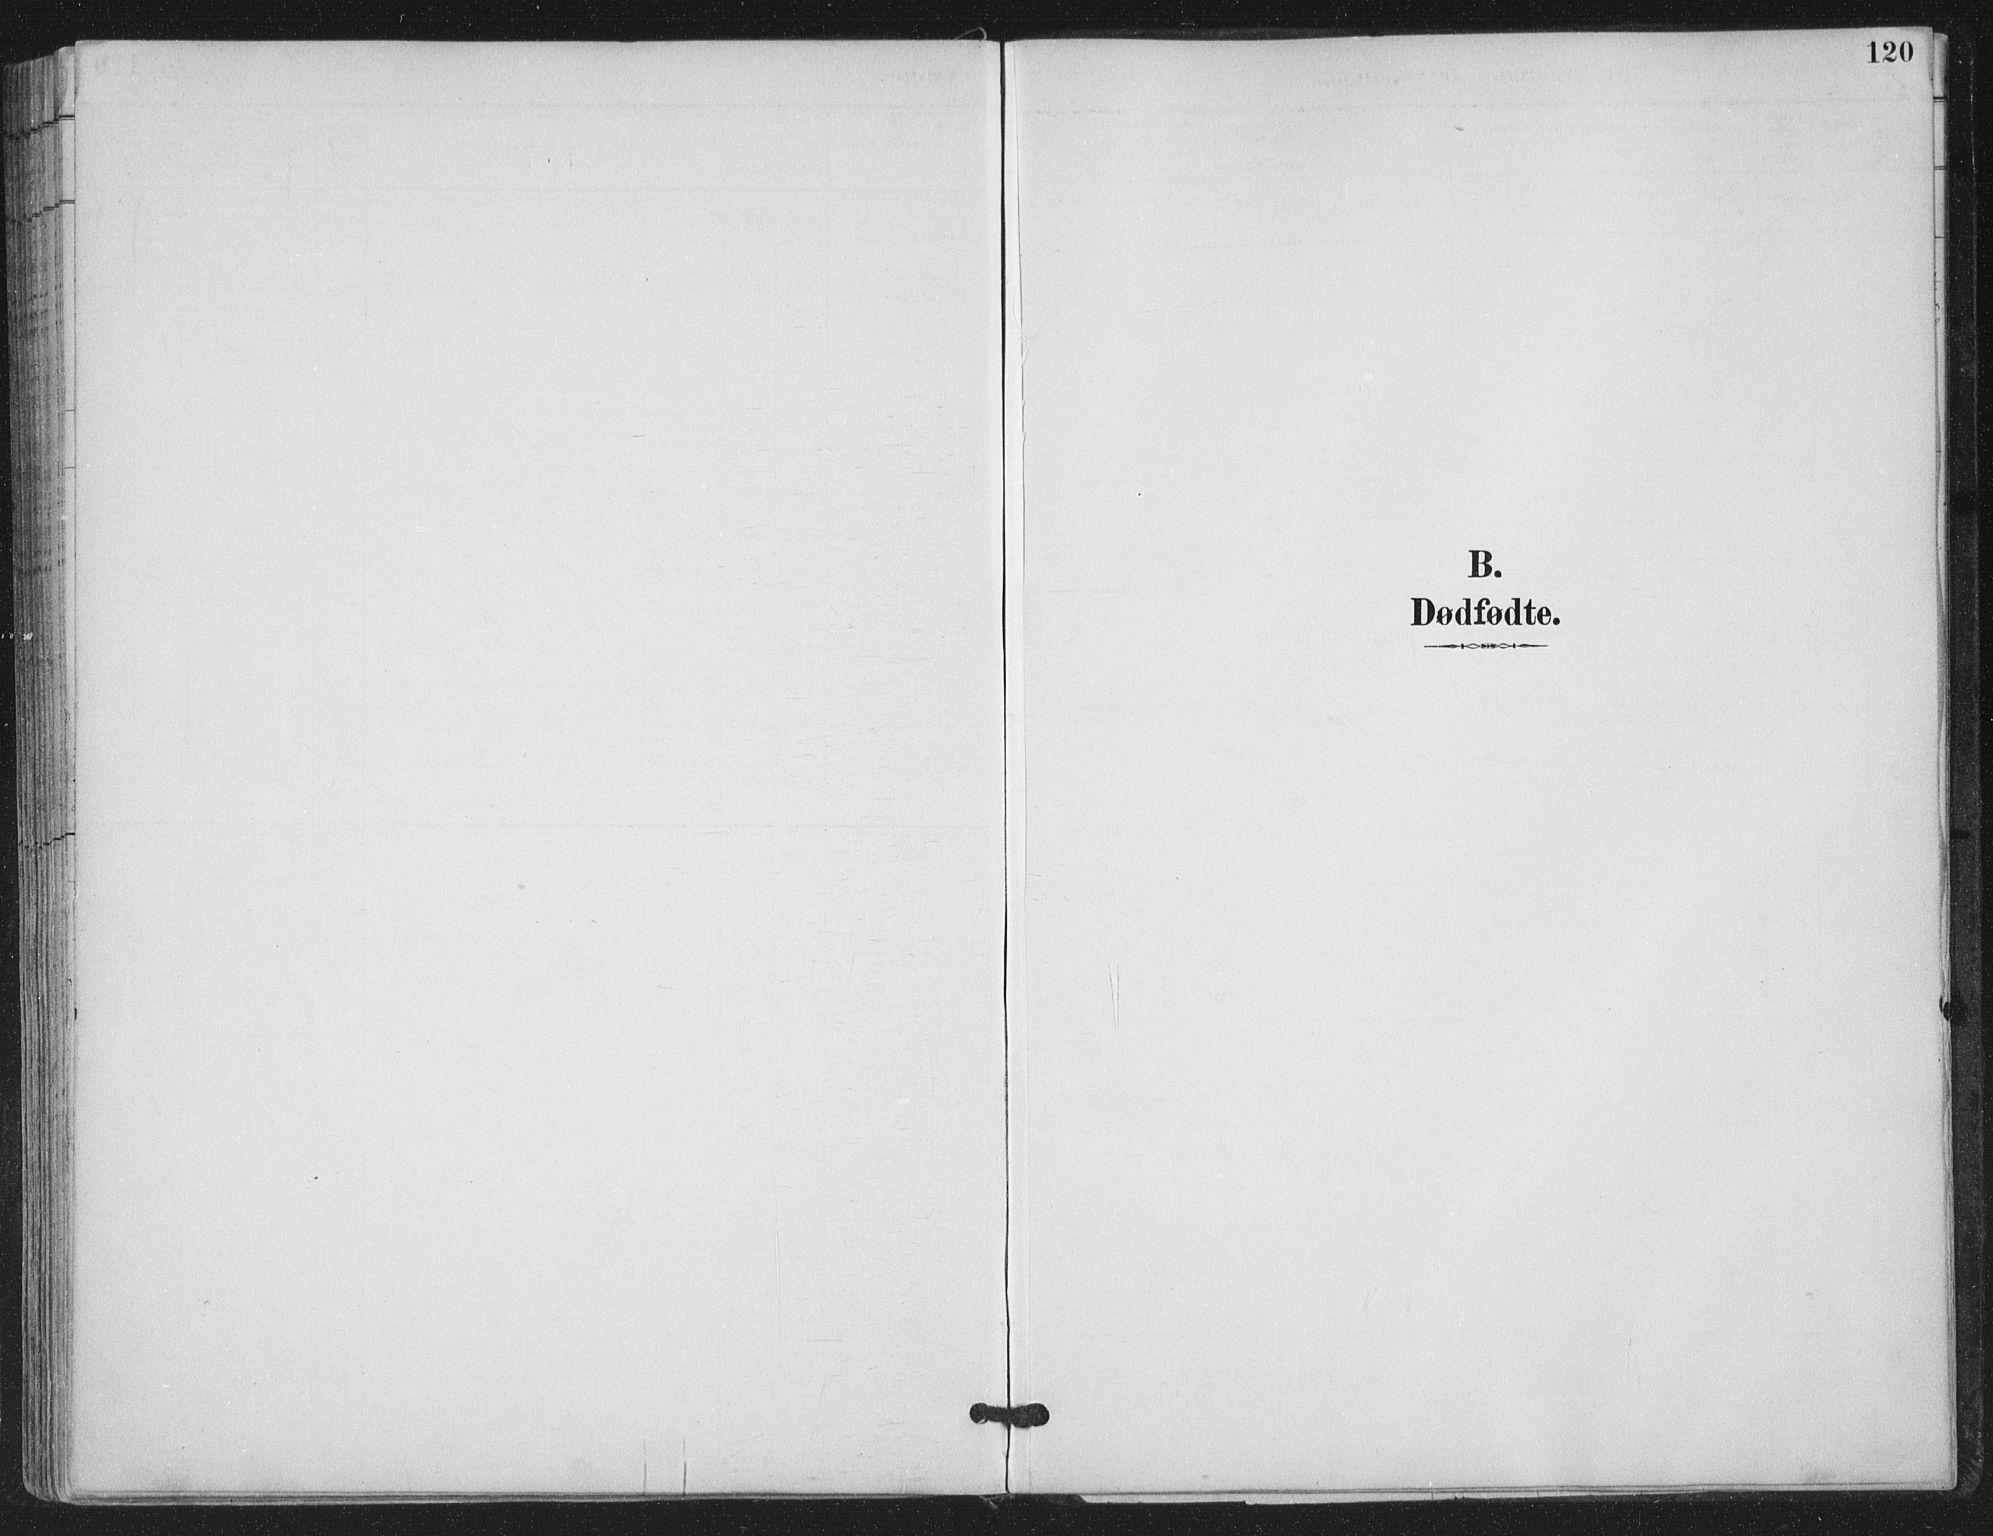 SAT, Ministerialprotokoller, klokkerbøker og fødselsregistre - Nordland, 843/L0628: Ministerialbok nr. 843A03, 1889-1907, s. 120